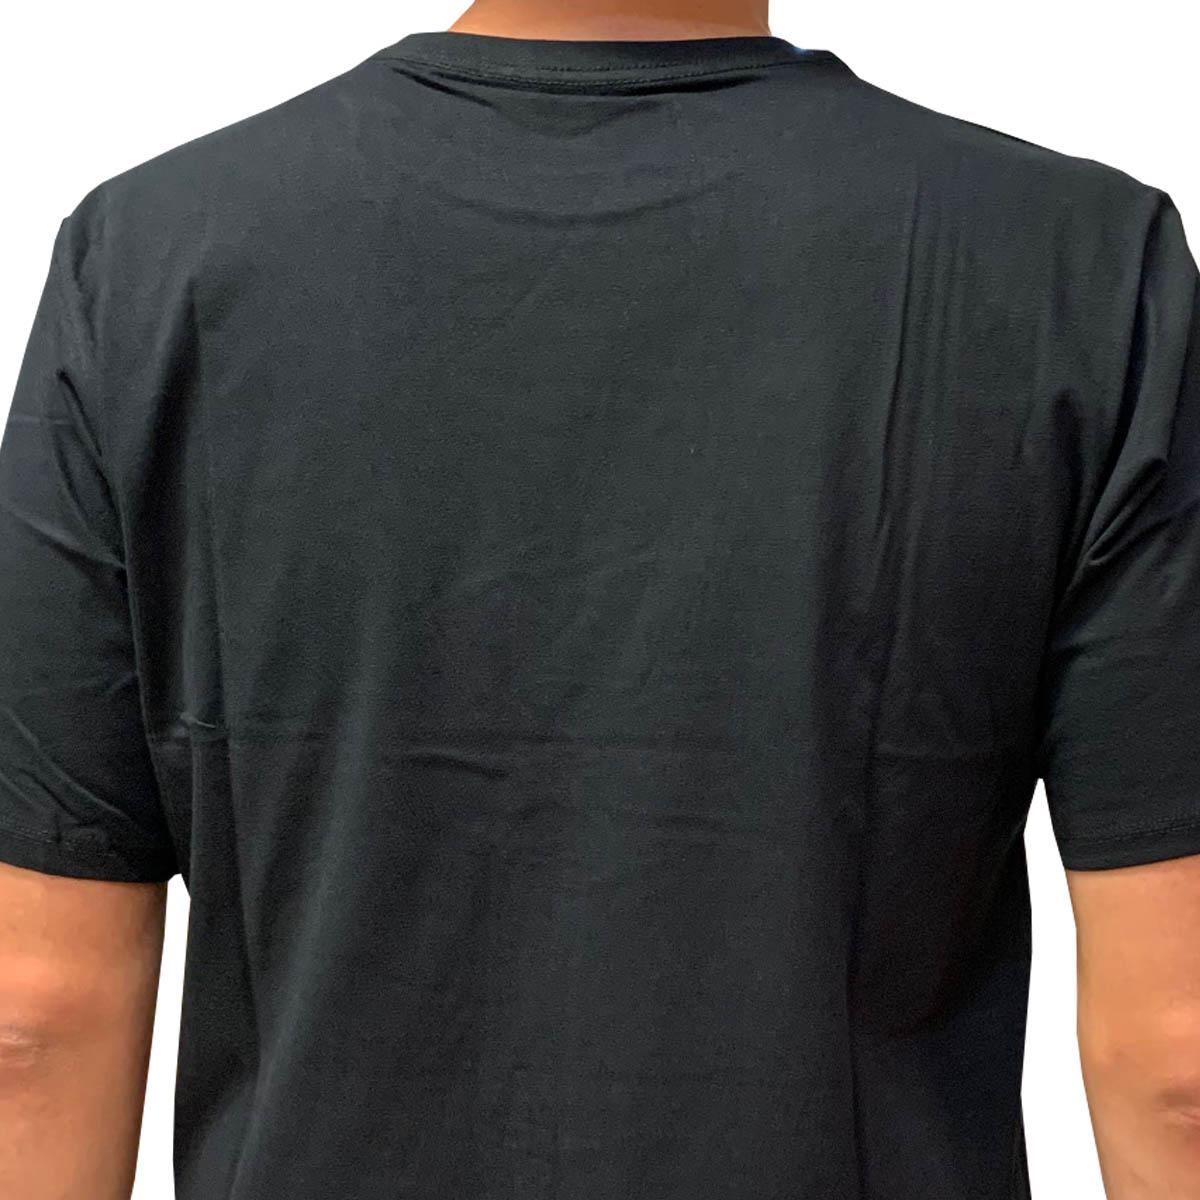 Camiseta Hurley 639000l18 masculina cores 63905